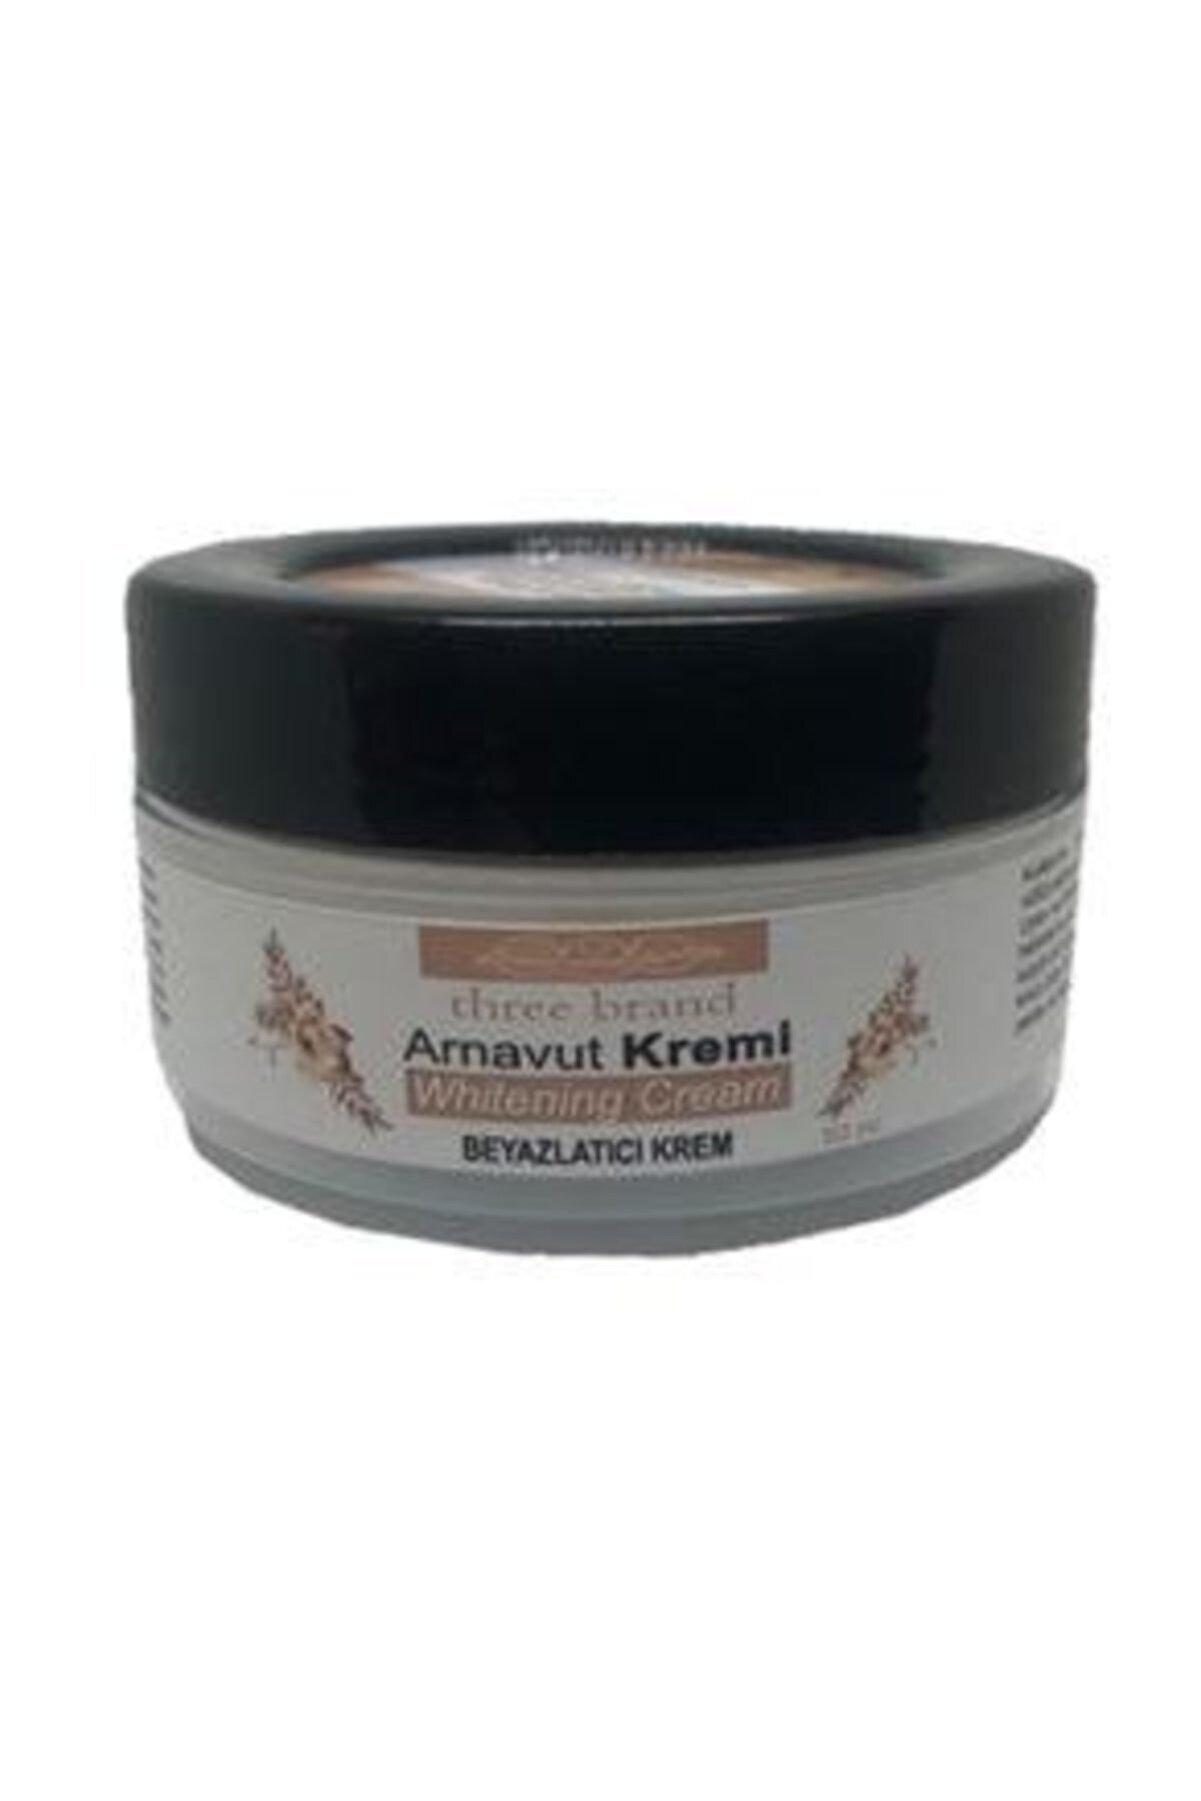 Three Brand Whitening Cream Arnavut Kremi 50 Ml Aklık Kremi - Beyazlatıcı Krem